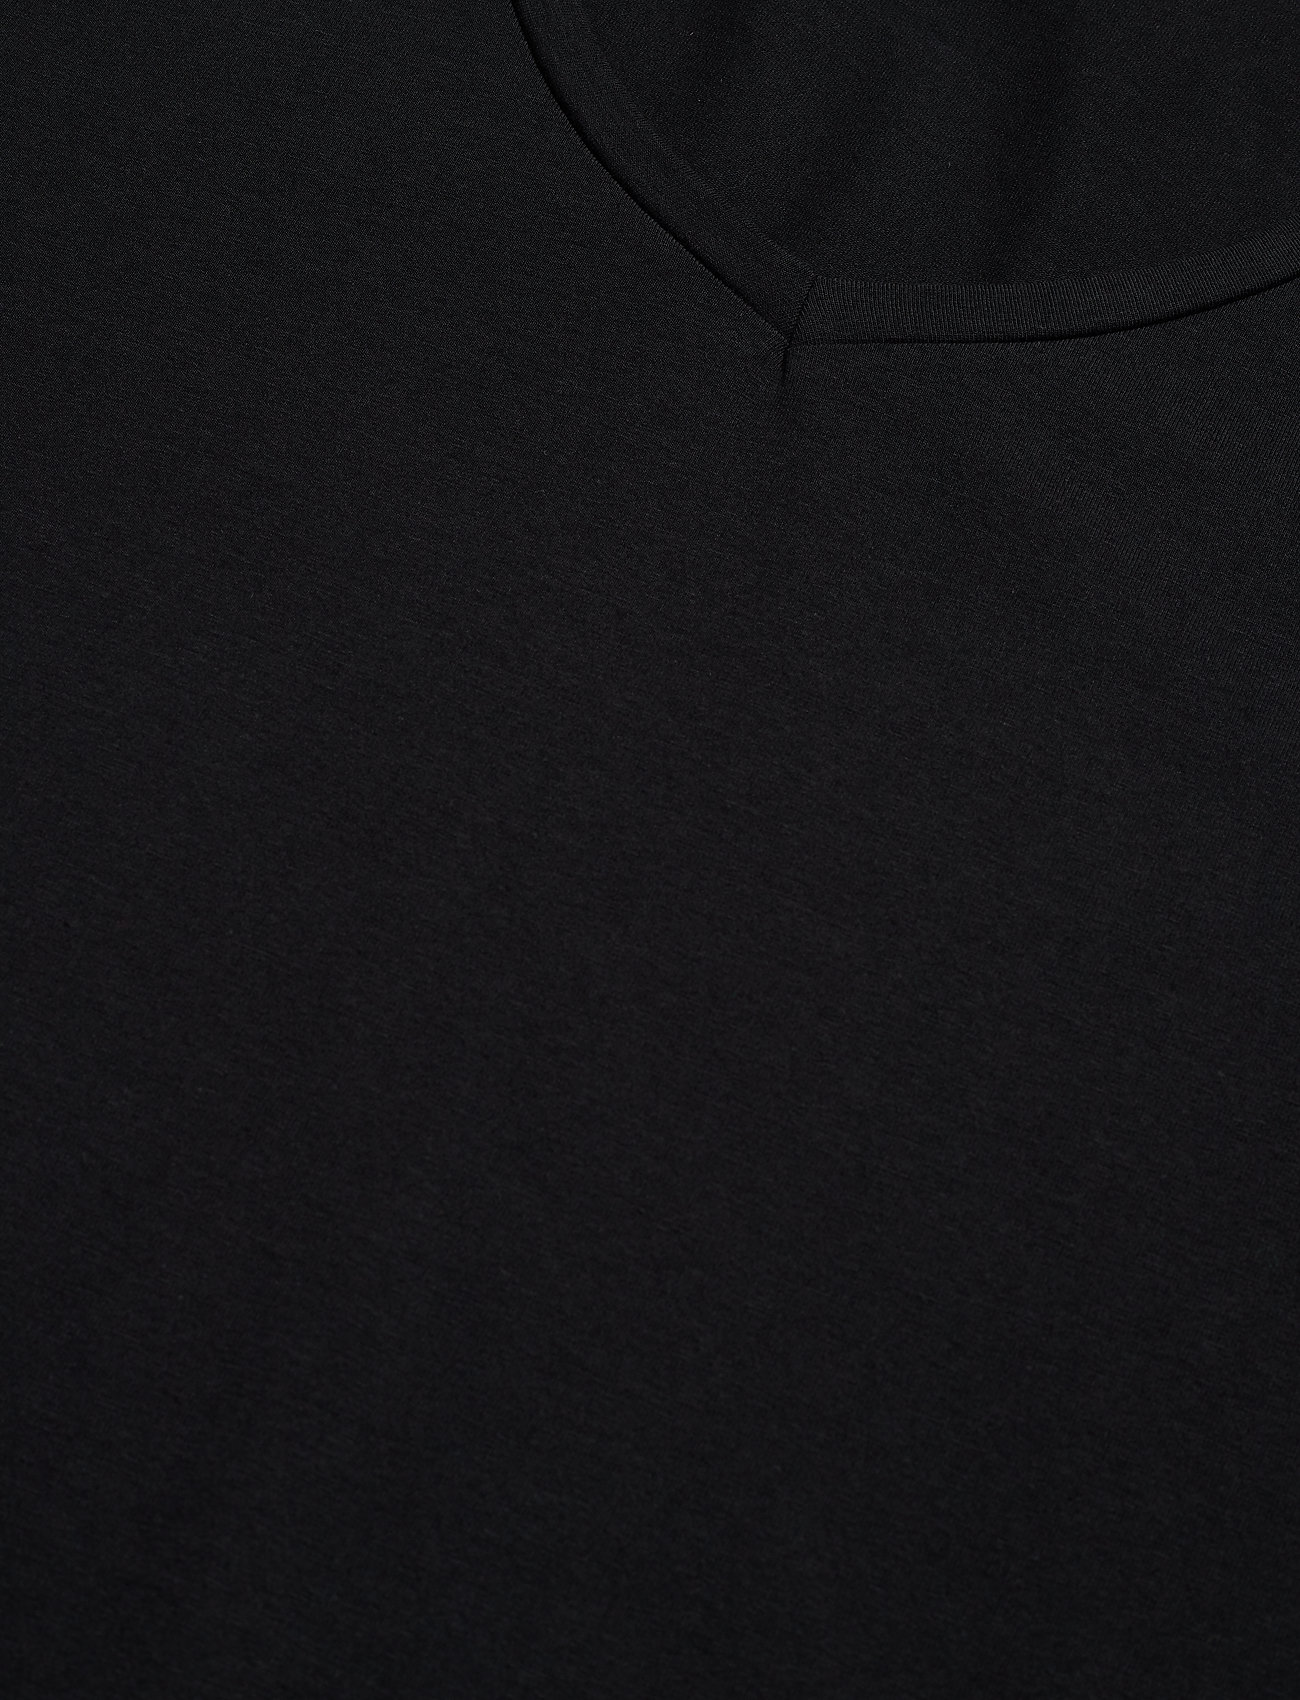 Zizzi S/S T-SHIRT NOOS - T-Shirts & Tops BLACK - Damen Kleidung